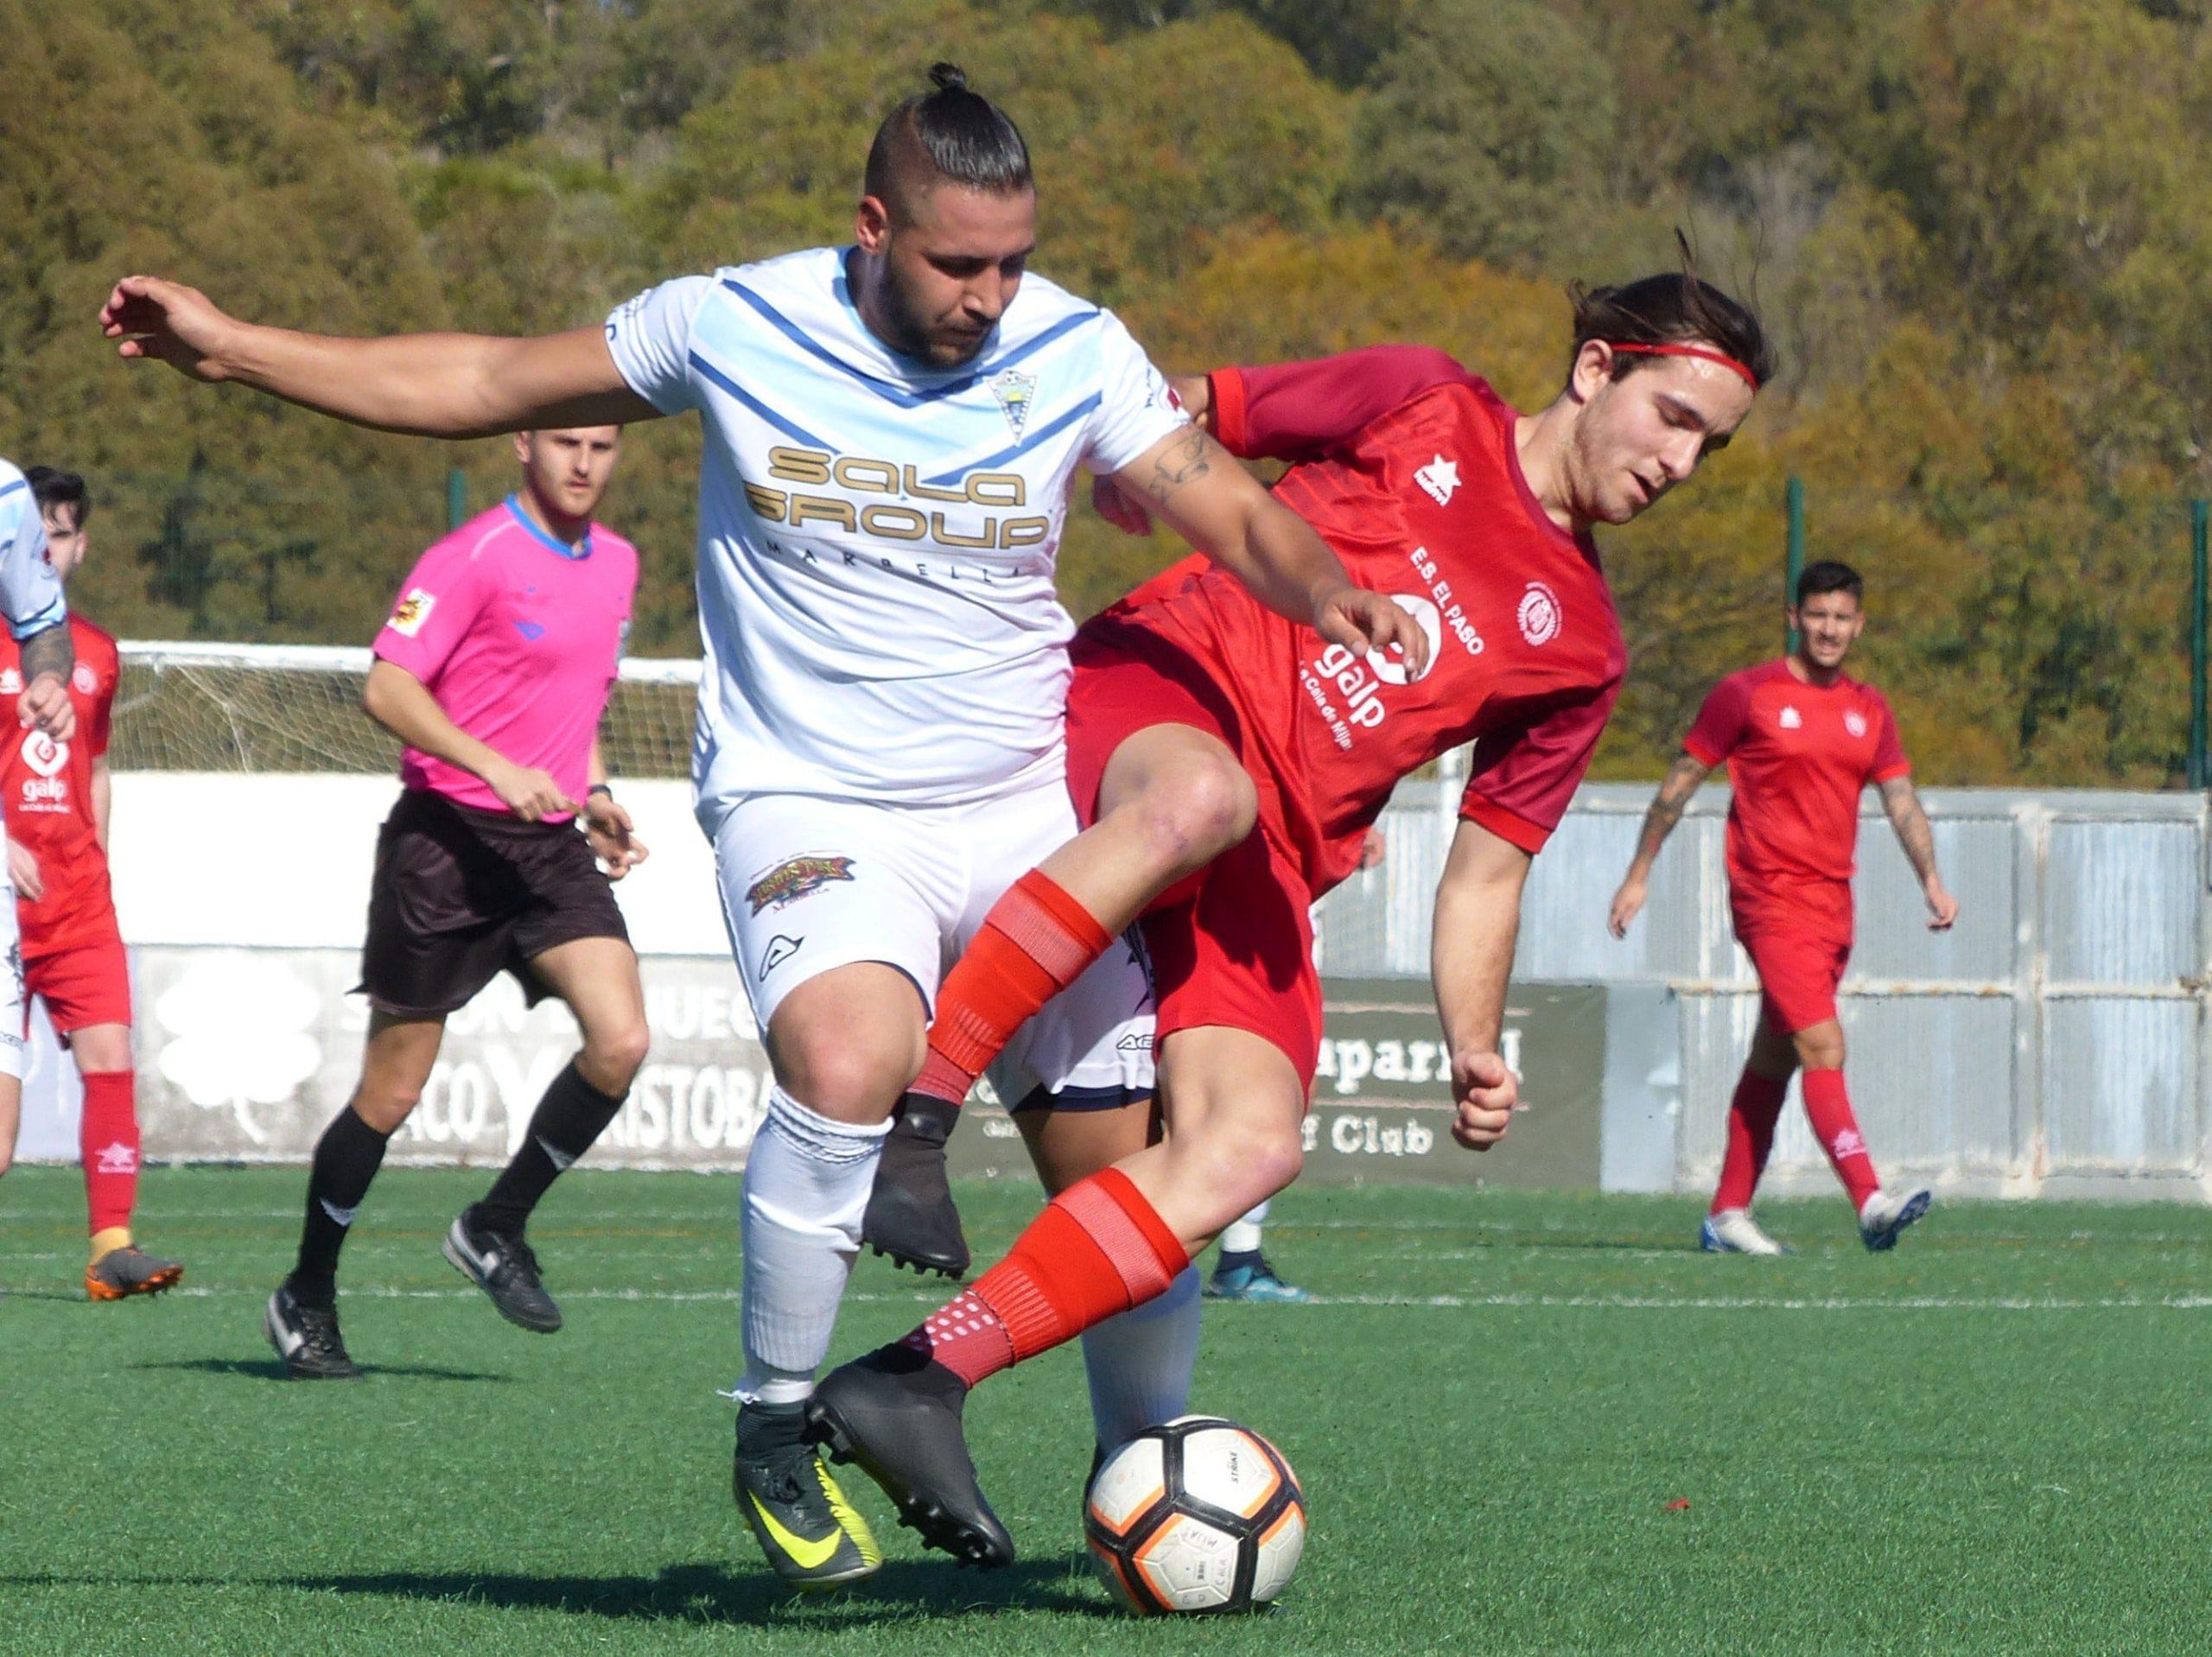 El C.D. Atlético Marbella logró la victoria ante el C.D. Cala de Mijas